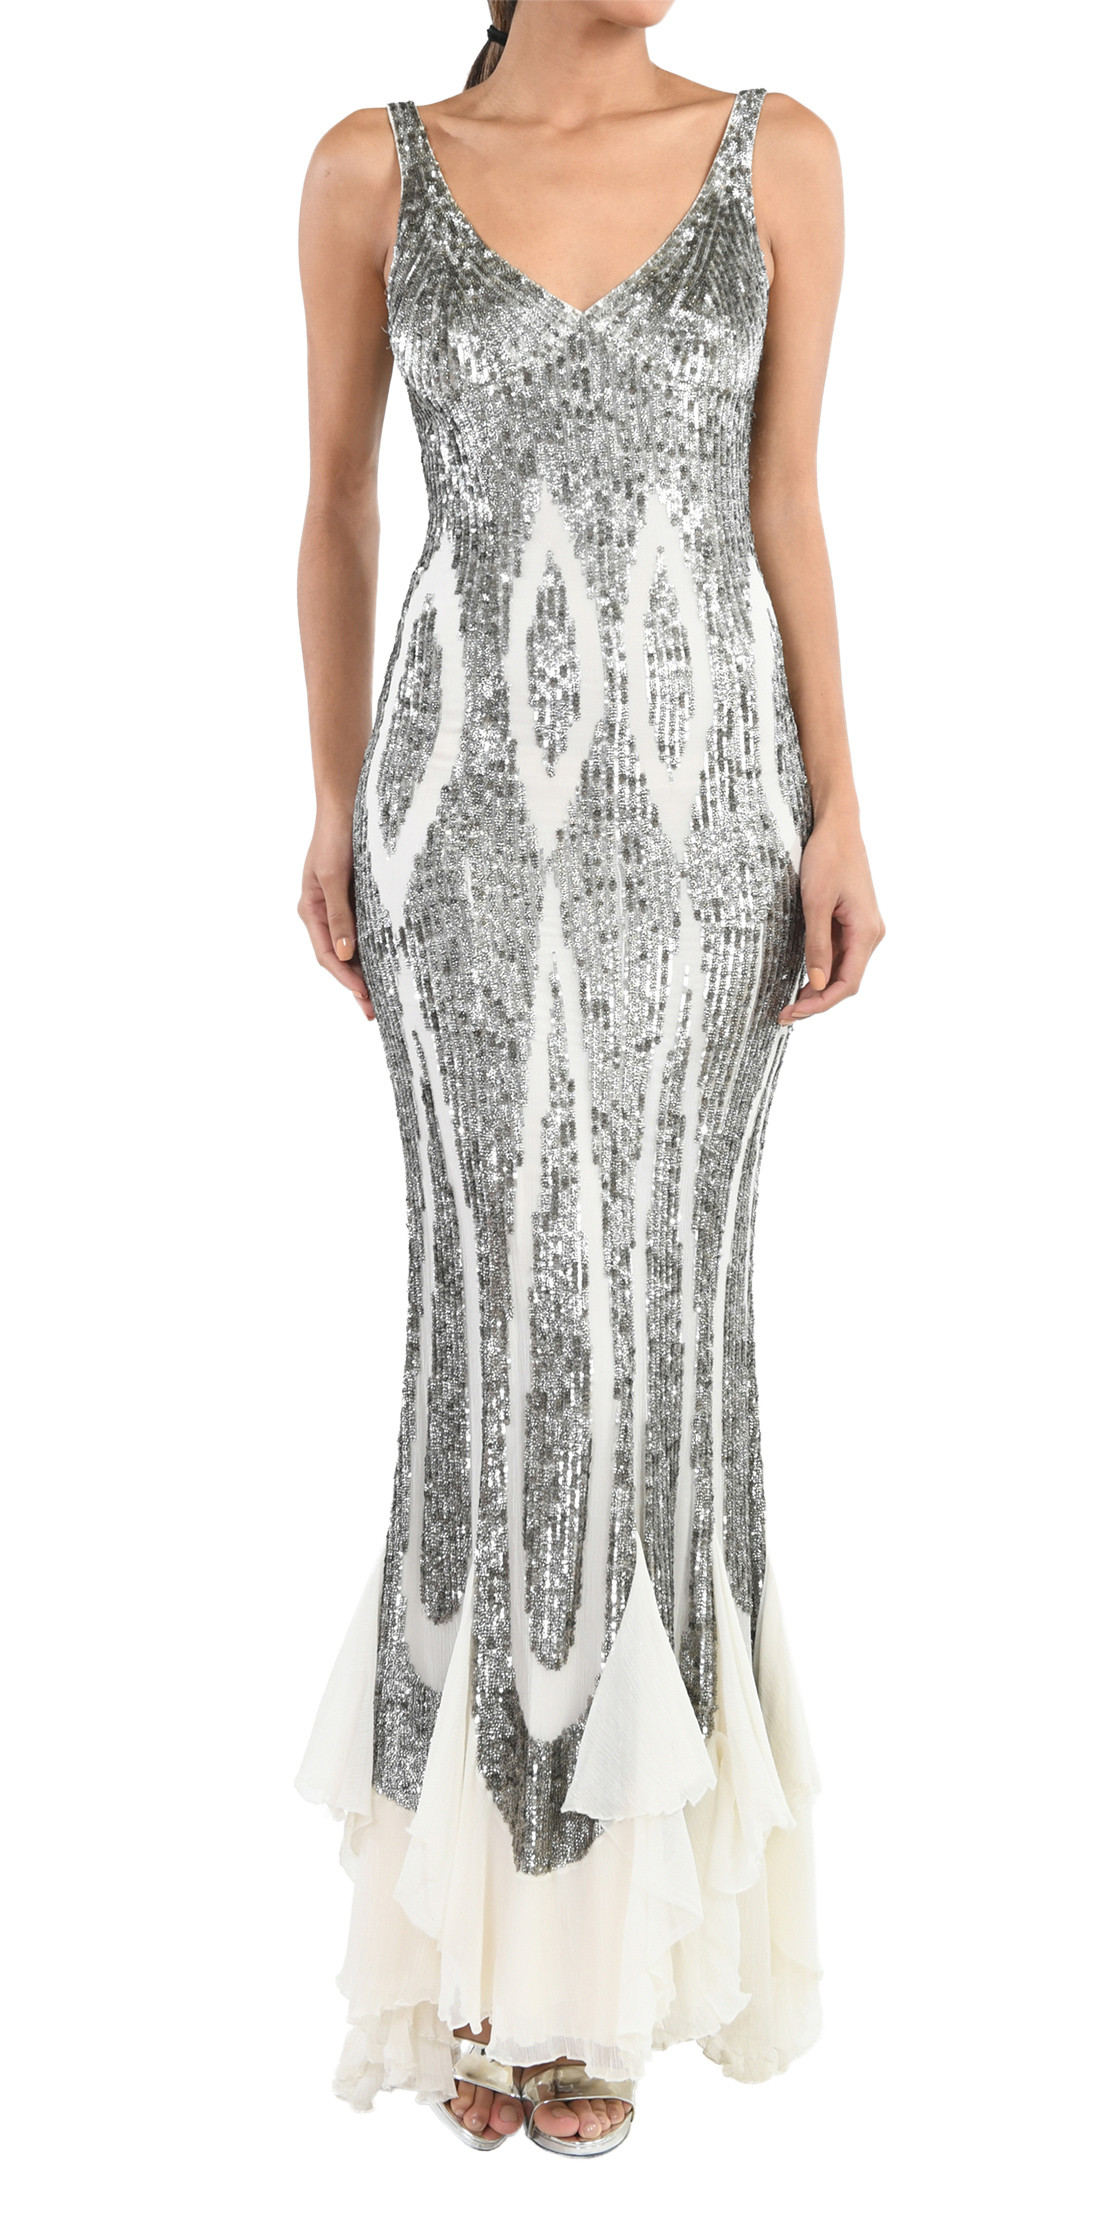 Elie Saab Ruffled Sequin Gown   Designer Dress Rental   Lebanon Rent ...